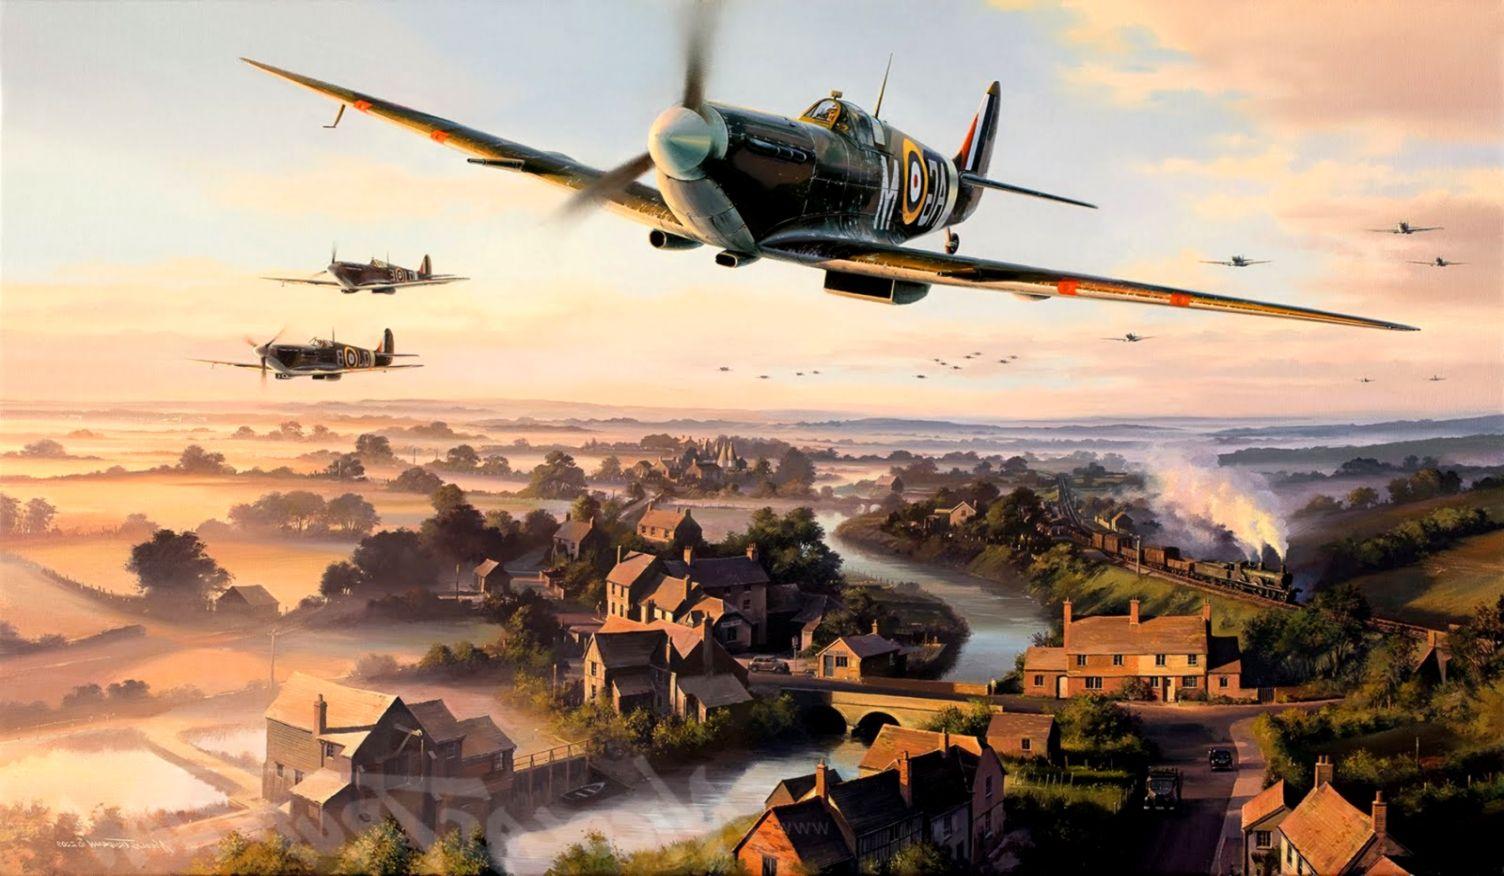 Wallpaper landscape sky airplane military aircraft World War